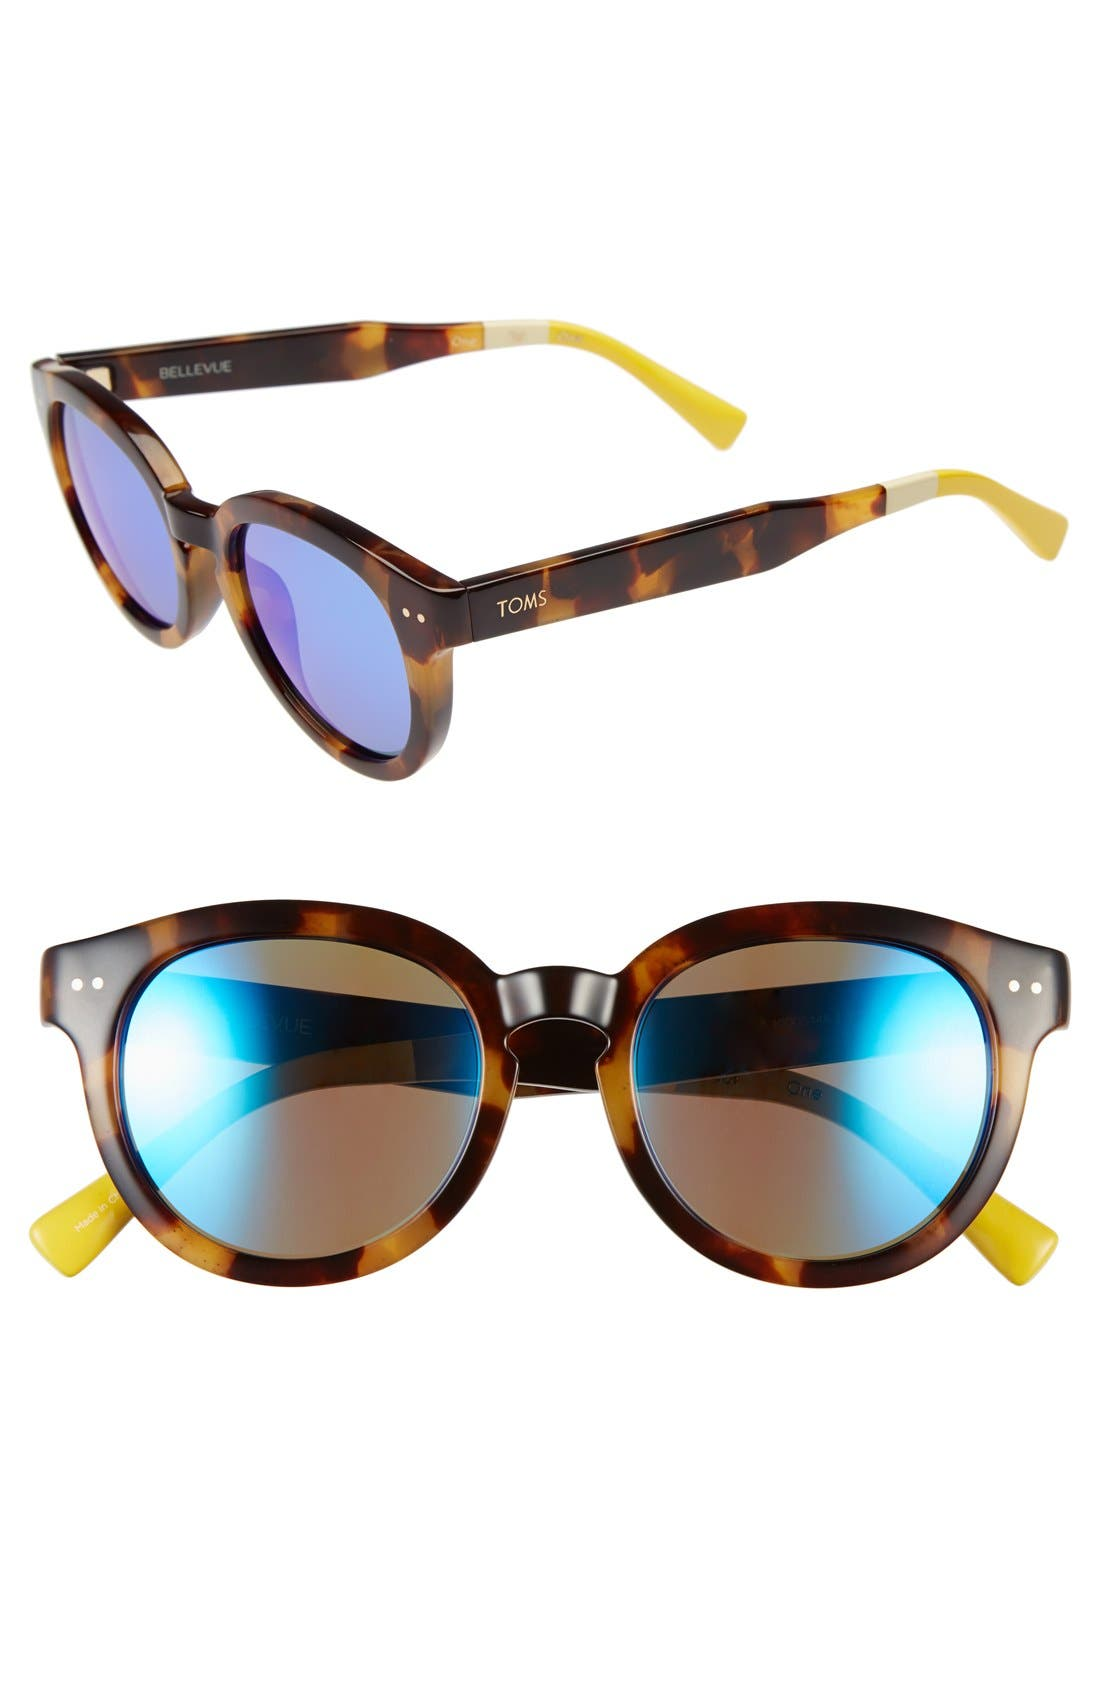 Main Image - TOMS 'Bellevue' 51mm Retro Sunglasses